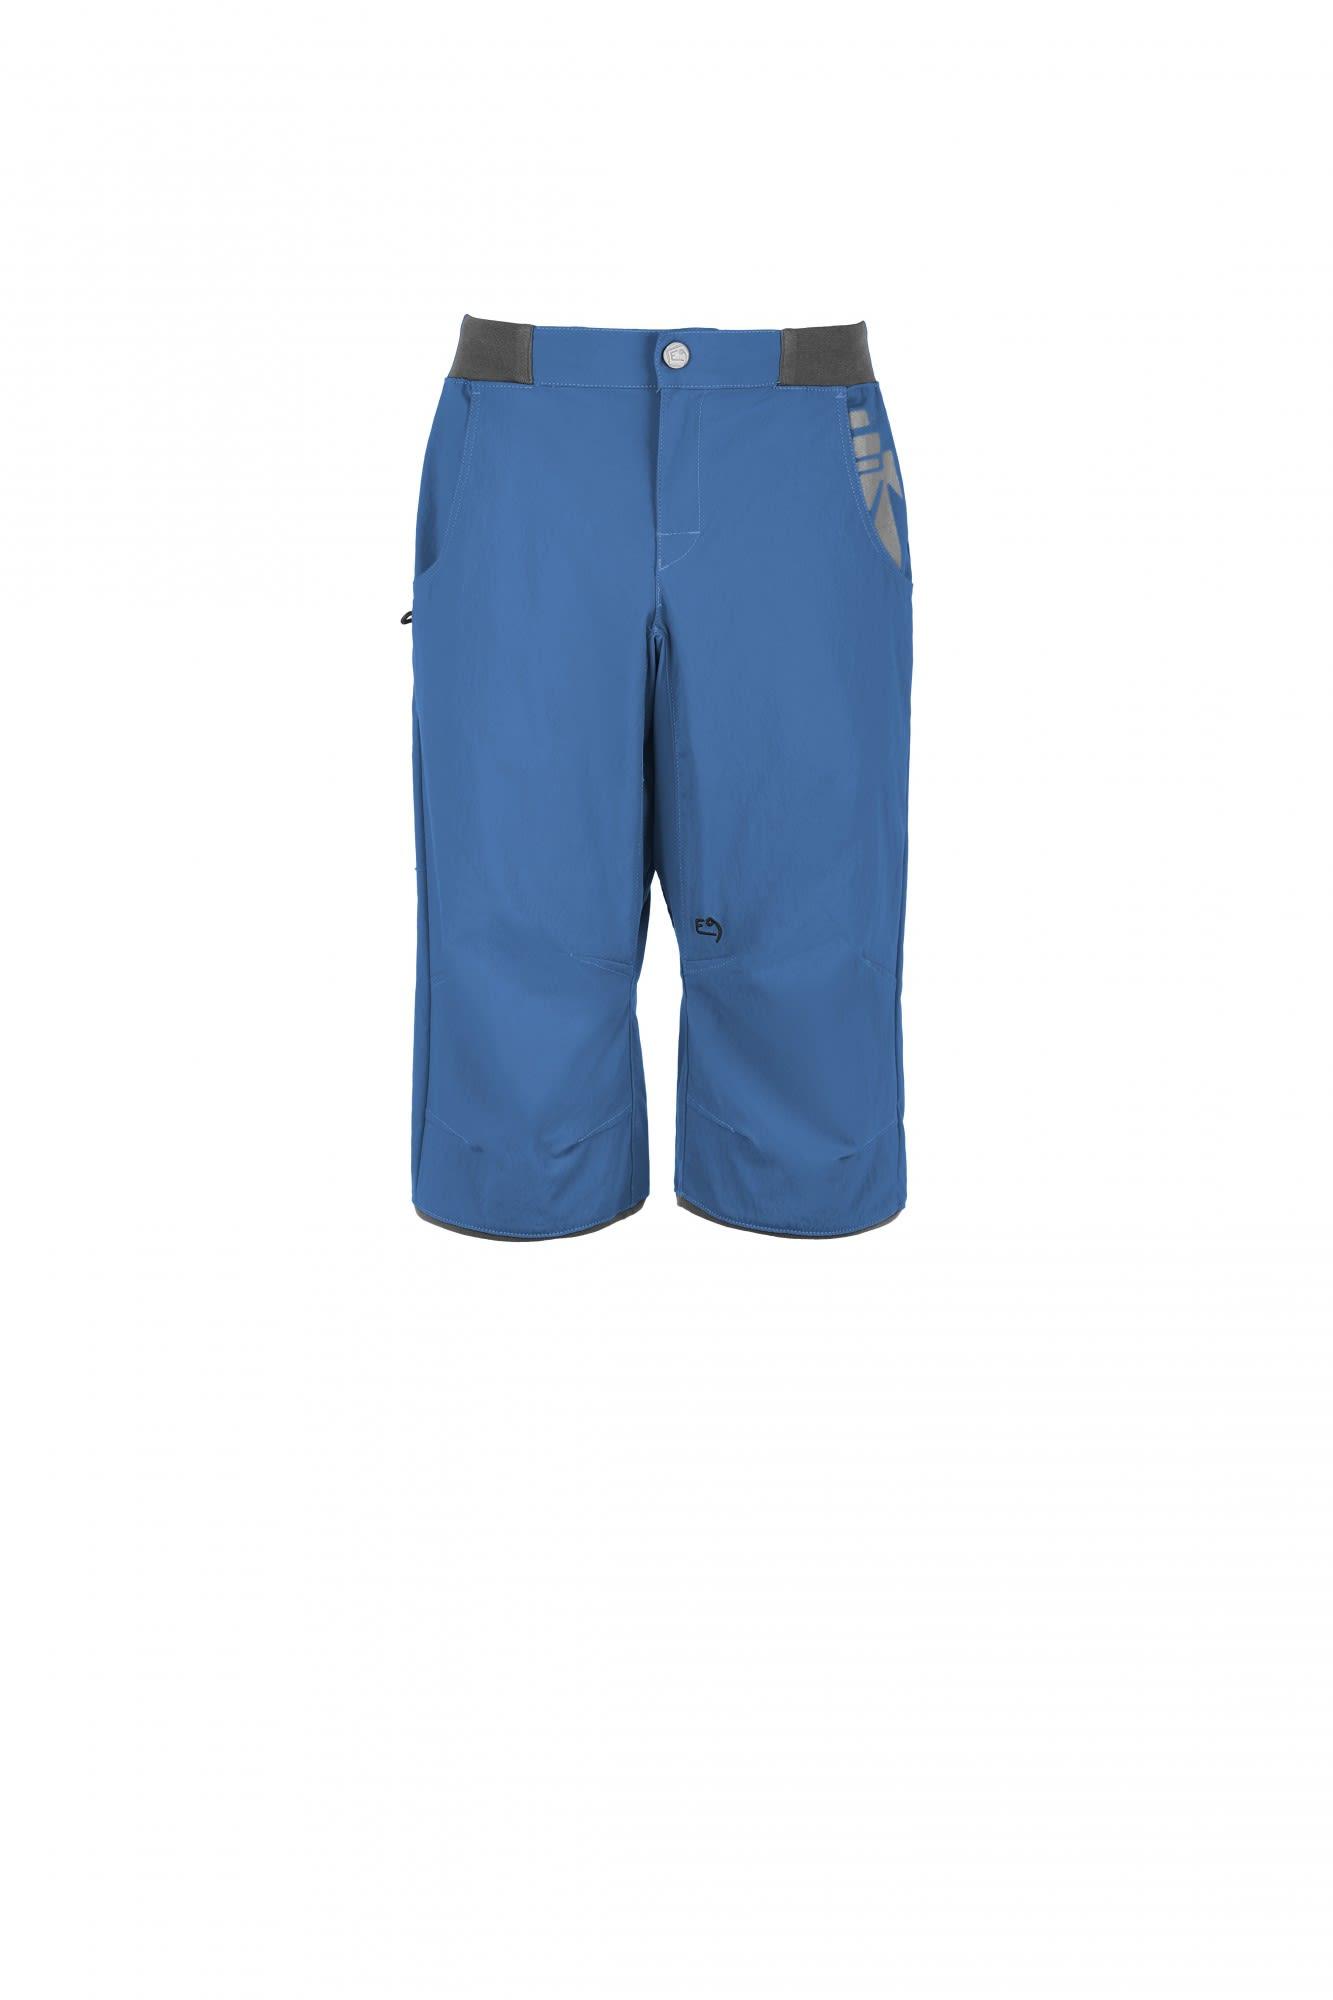 E9 M 3qart | Größe S,L | Herren Shorts